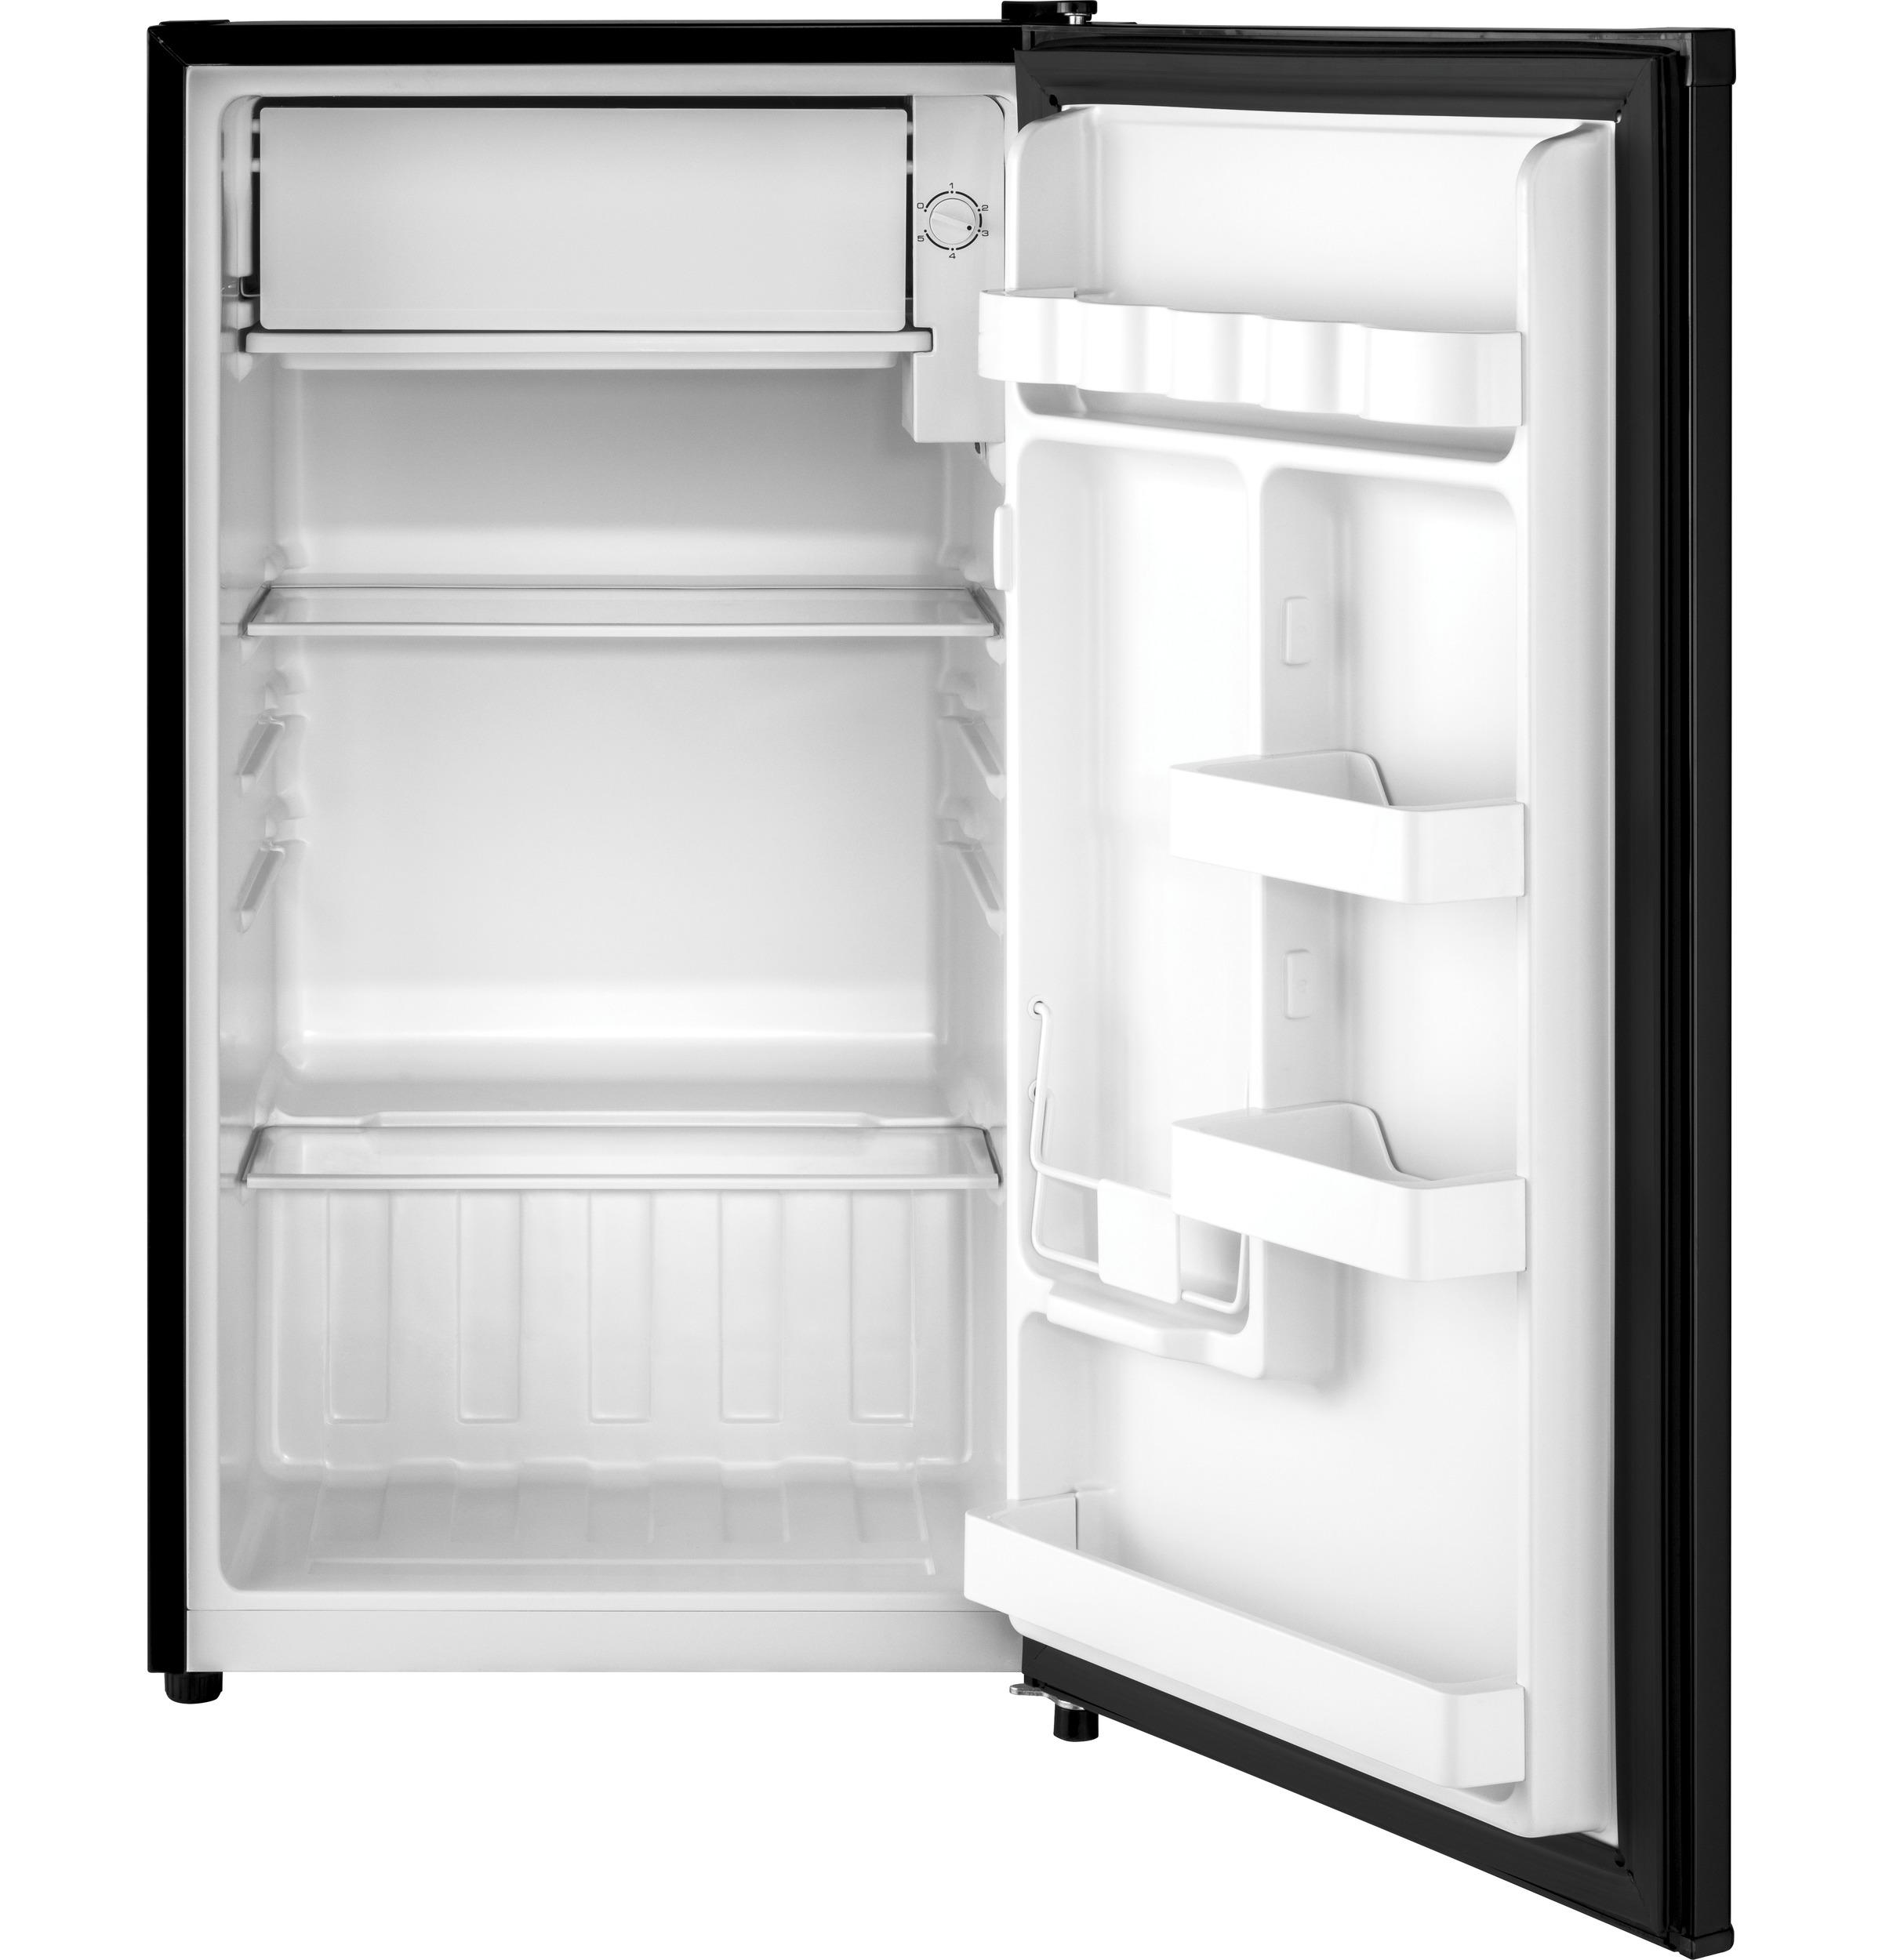 Model: HC33SW20RB | 3.3 Cu. Ft. Compact Refrigerator